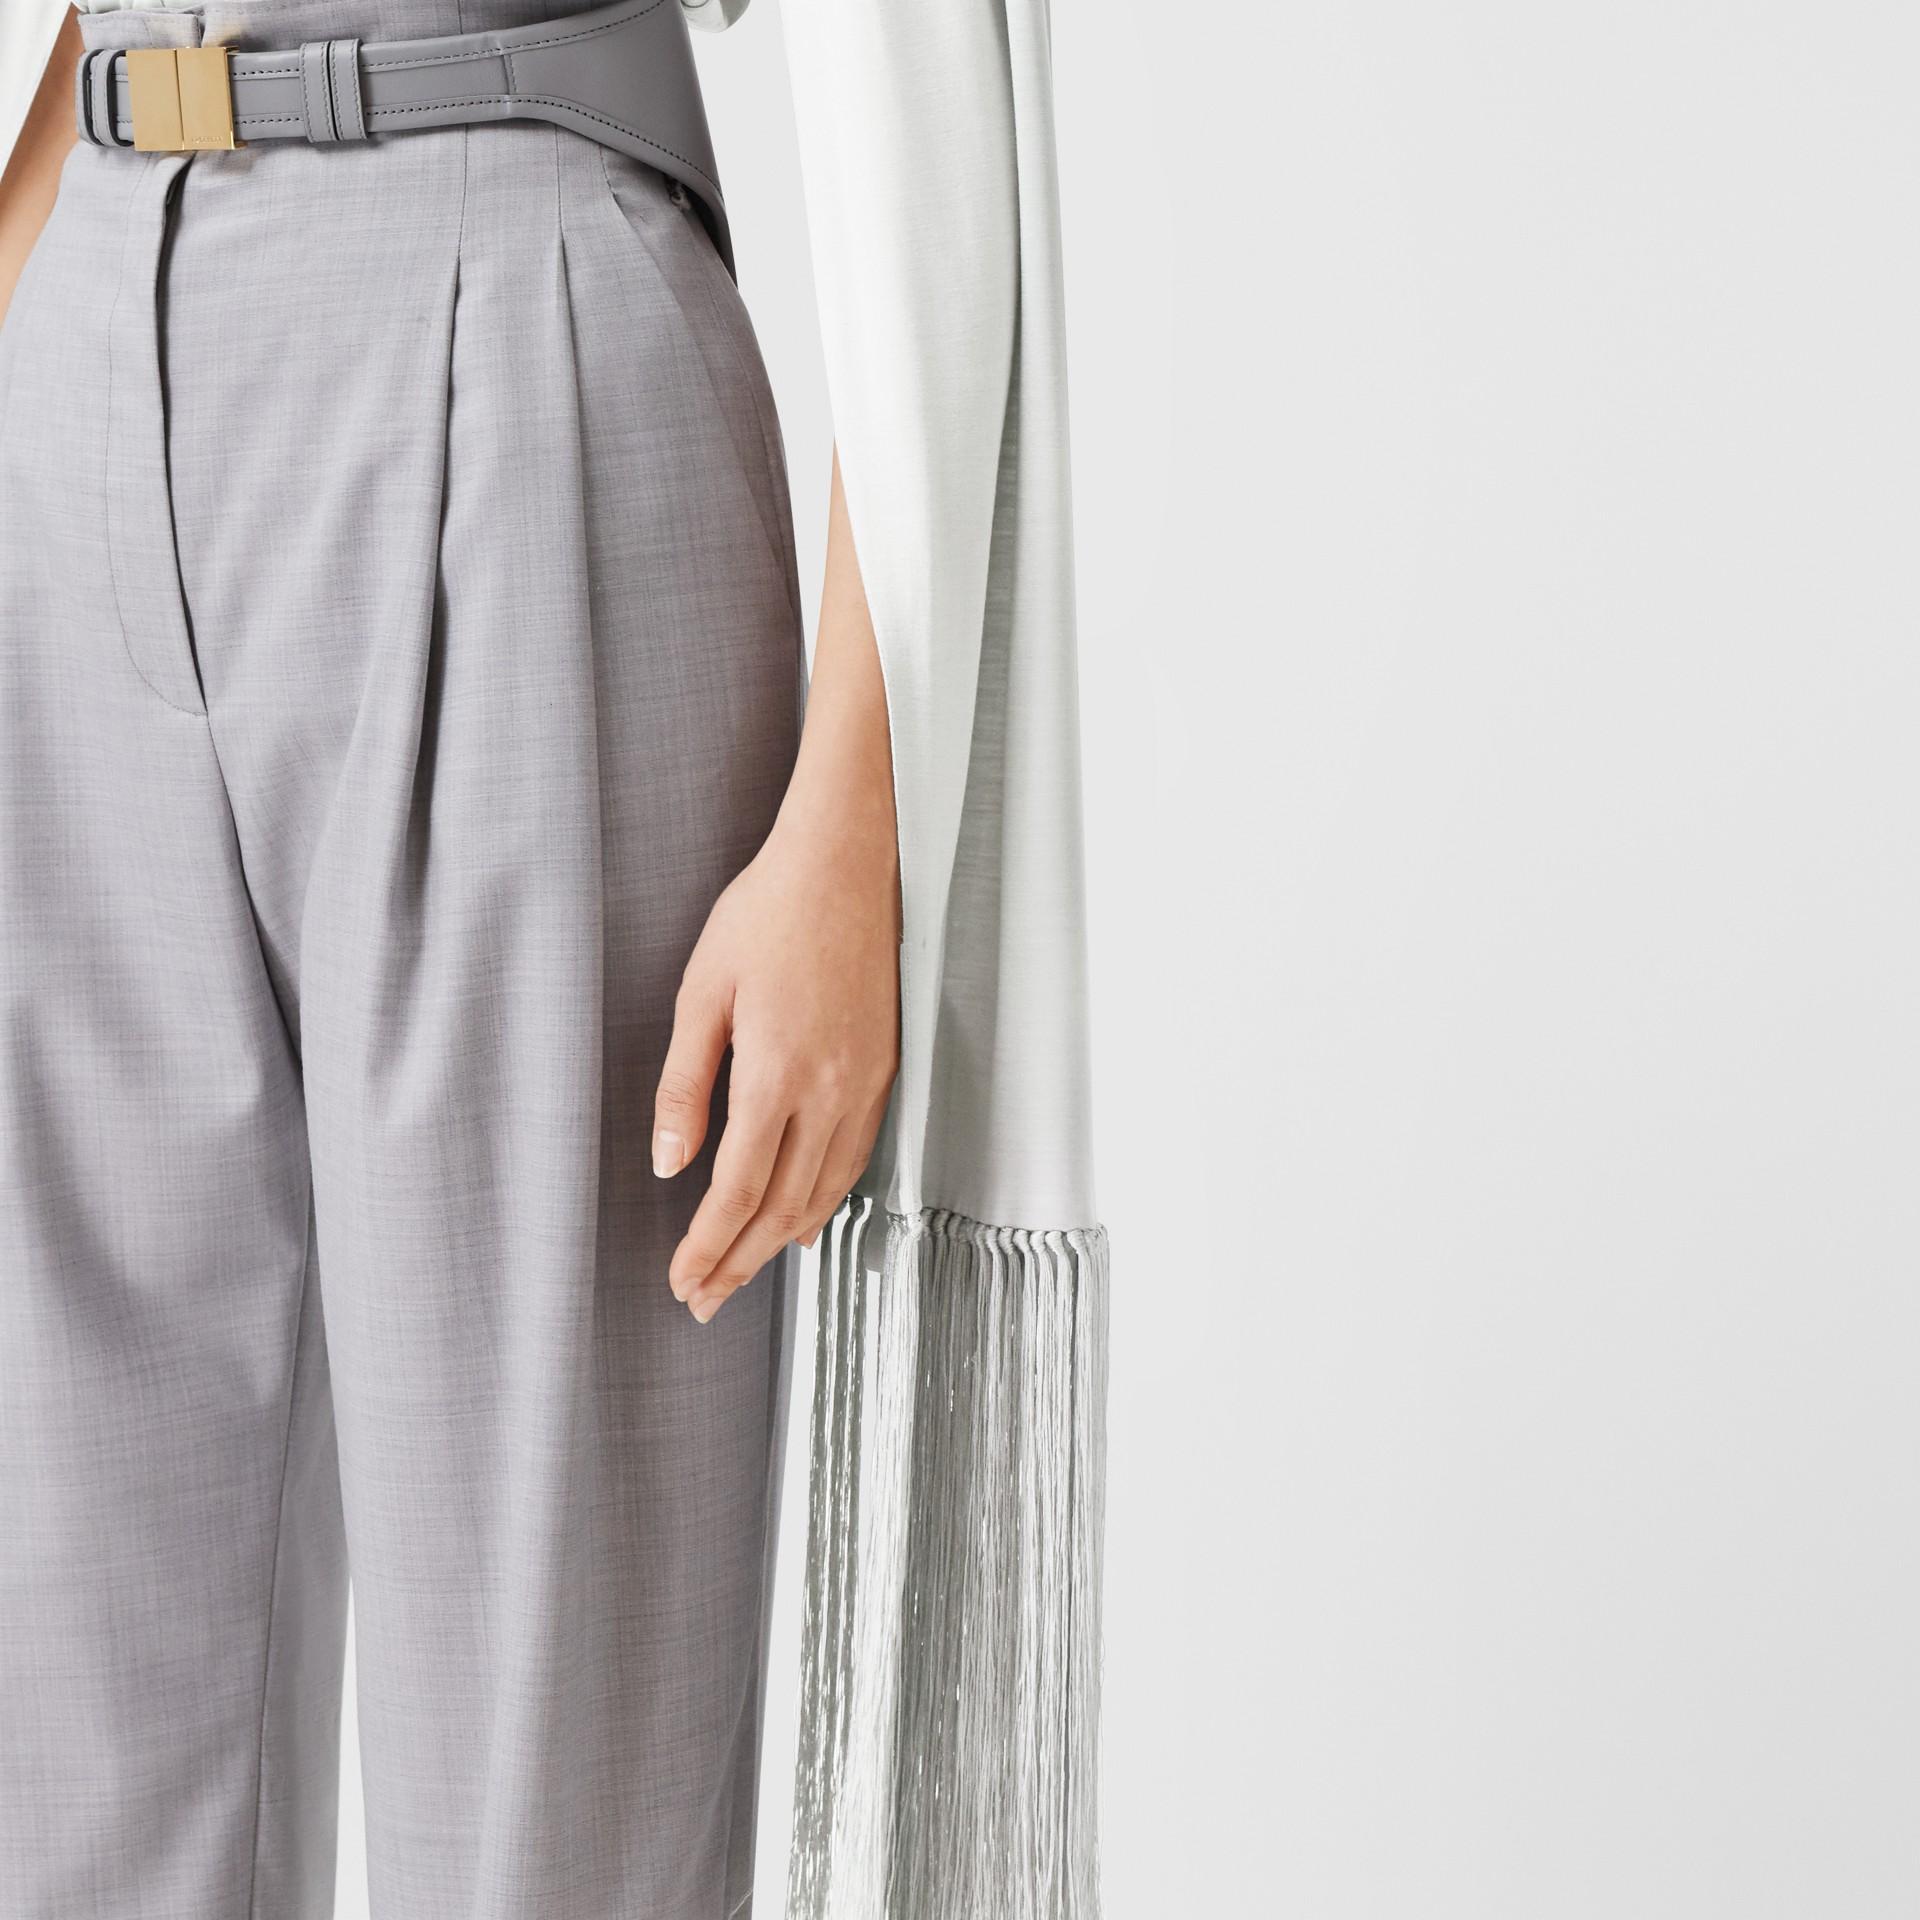 Fringed Silk Wool Jersey Shirt in Grey Melange - Women | Burberry Canada - gallery image 5